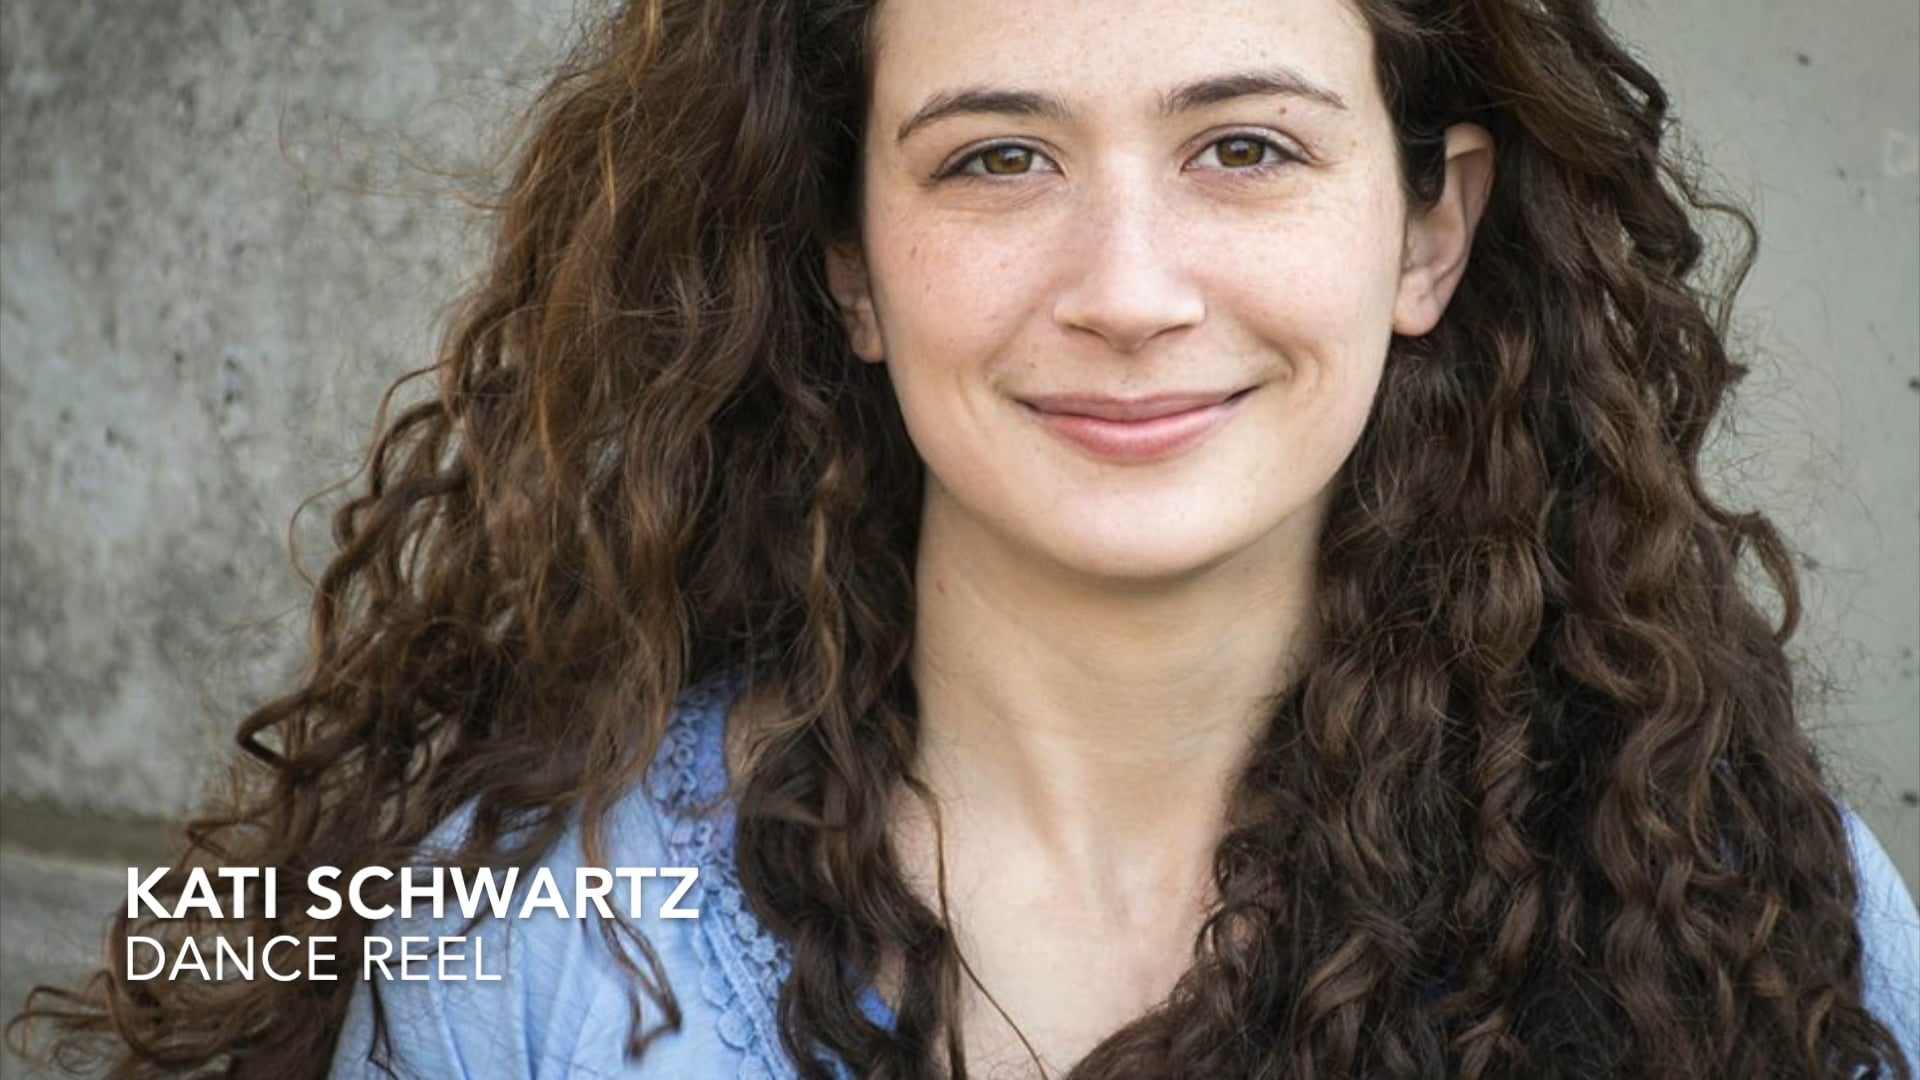 Kati Schwartz dance reel